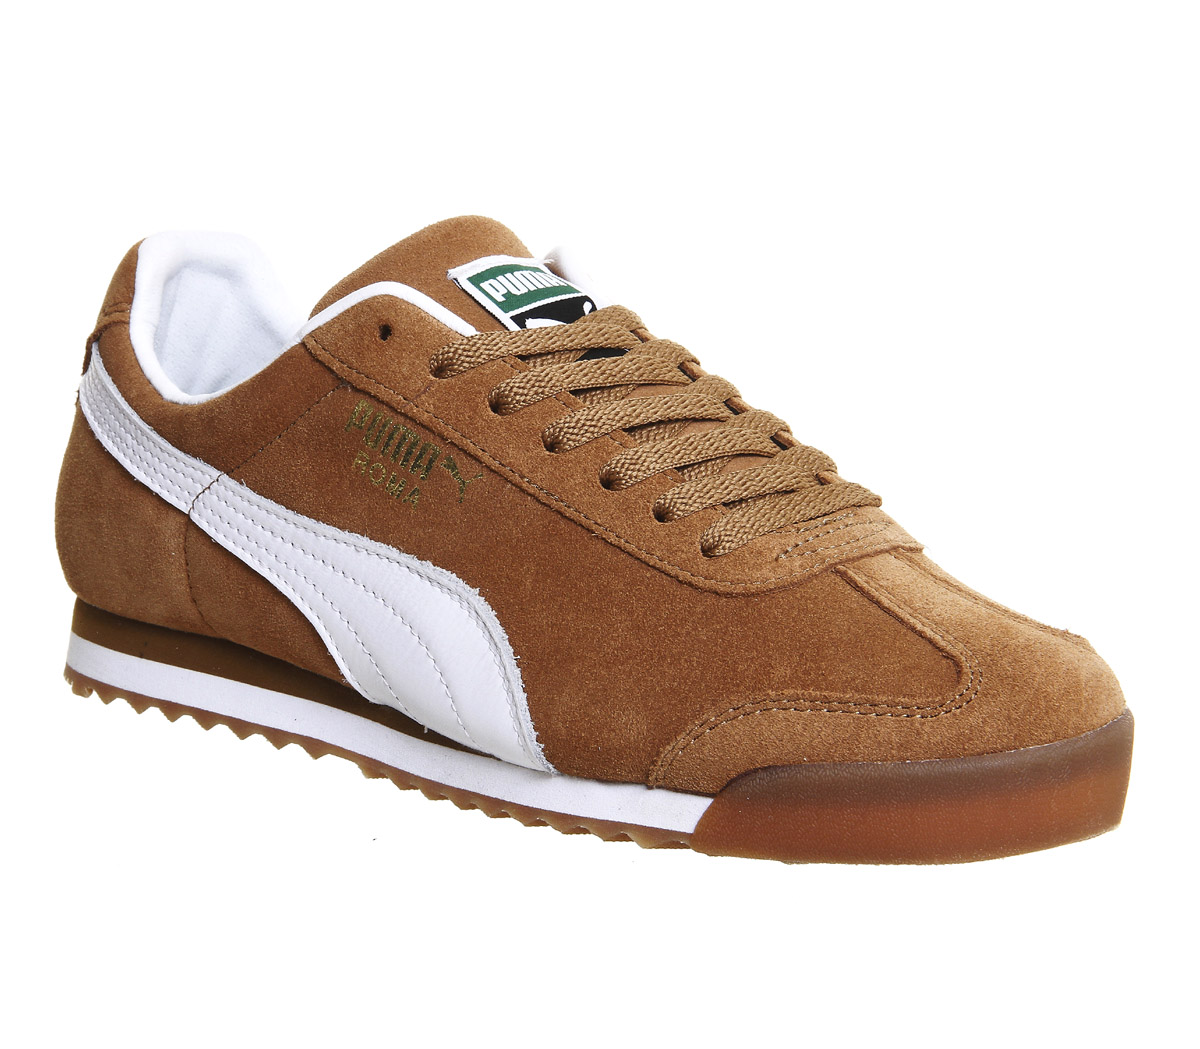 Puma-Roma-CHESTNUT-WHITE-GUM-EXCLUSIVE-Trainers-Shoes